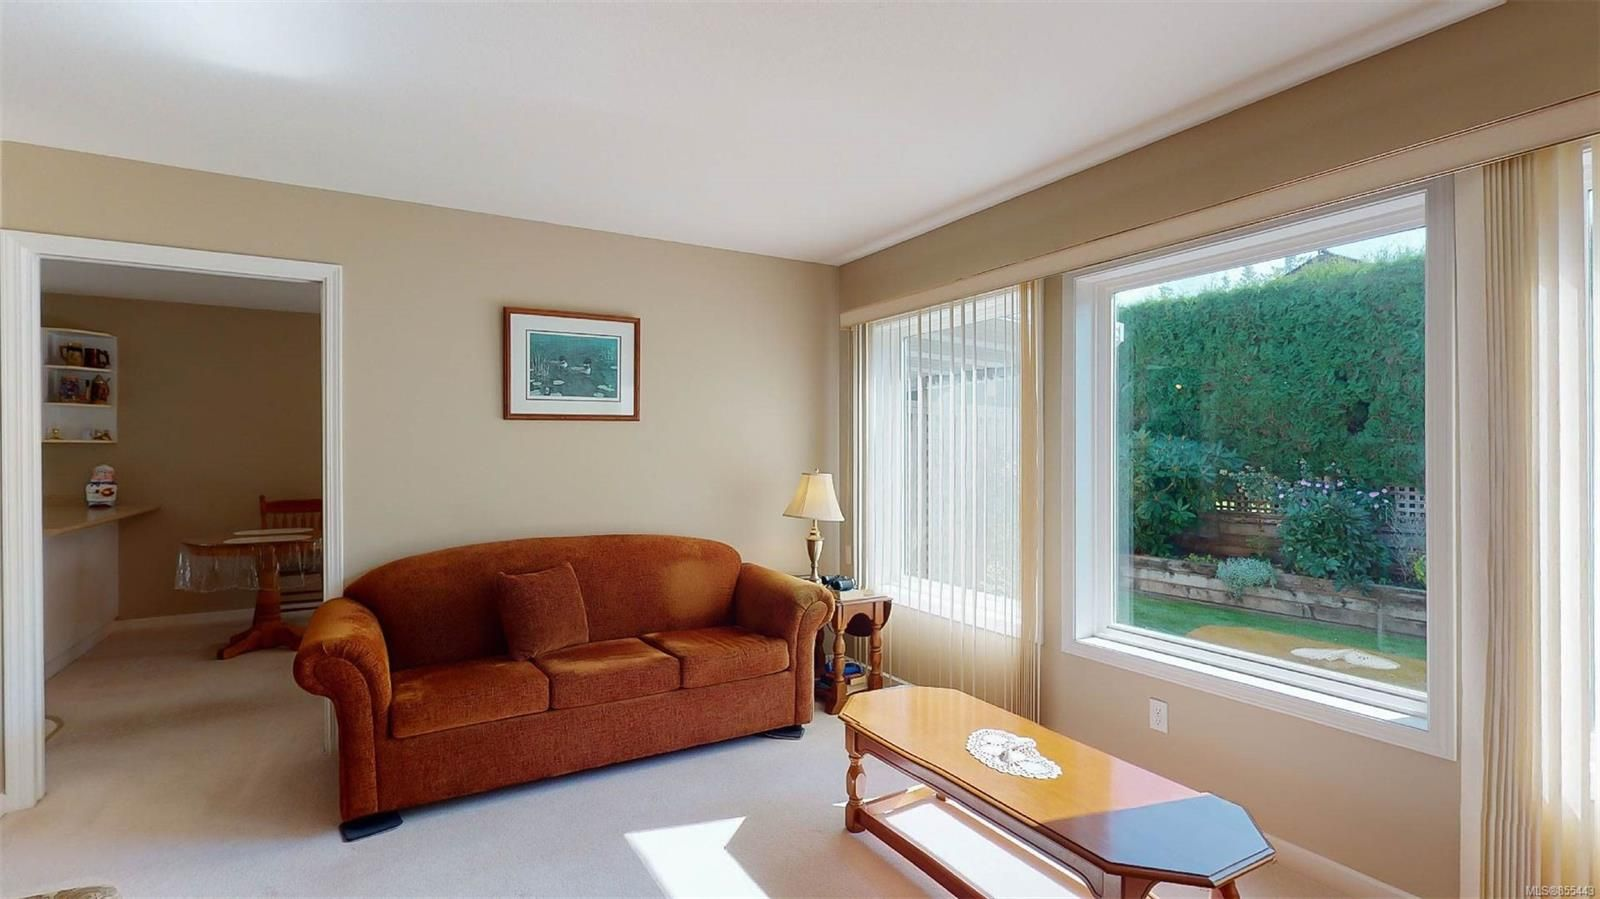 Photo 17: Photos: 1294 Leeward Way in : PQ Qualicum Beach House for sale (Parksville/Qualicum)  : MLS®# 855443